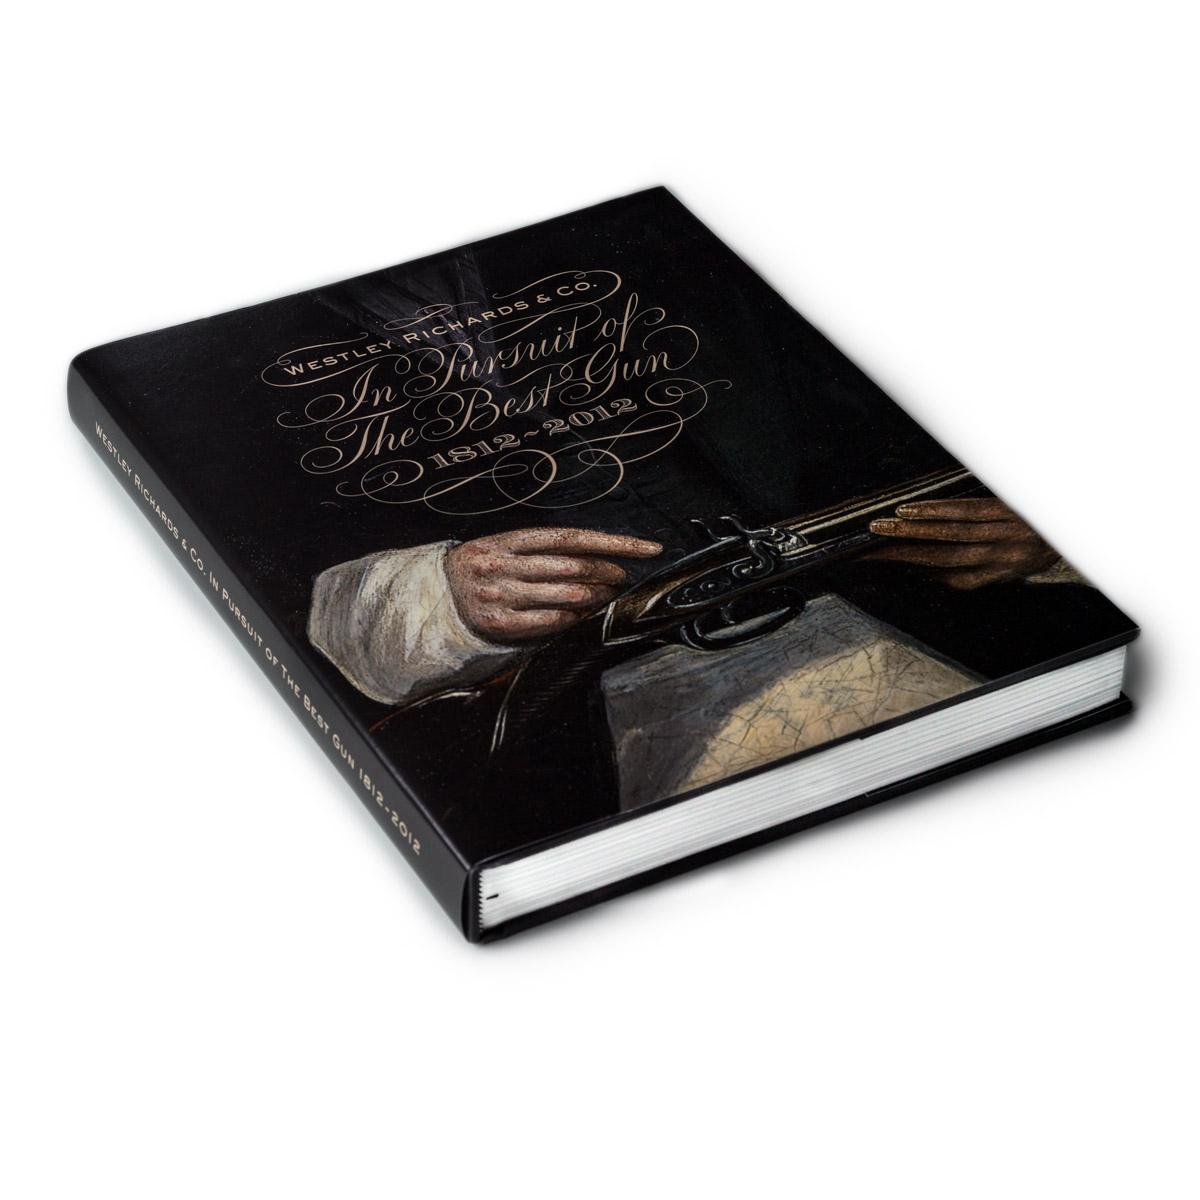 Westley Richards, In Pursuit of the Best Gun 1812 -2012.